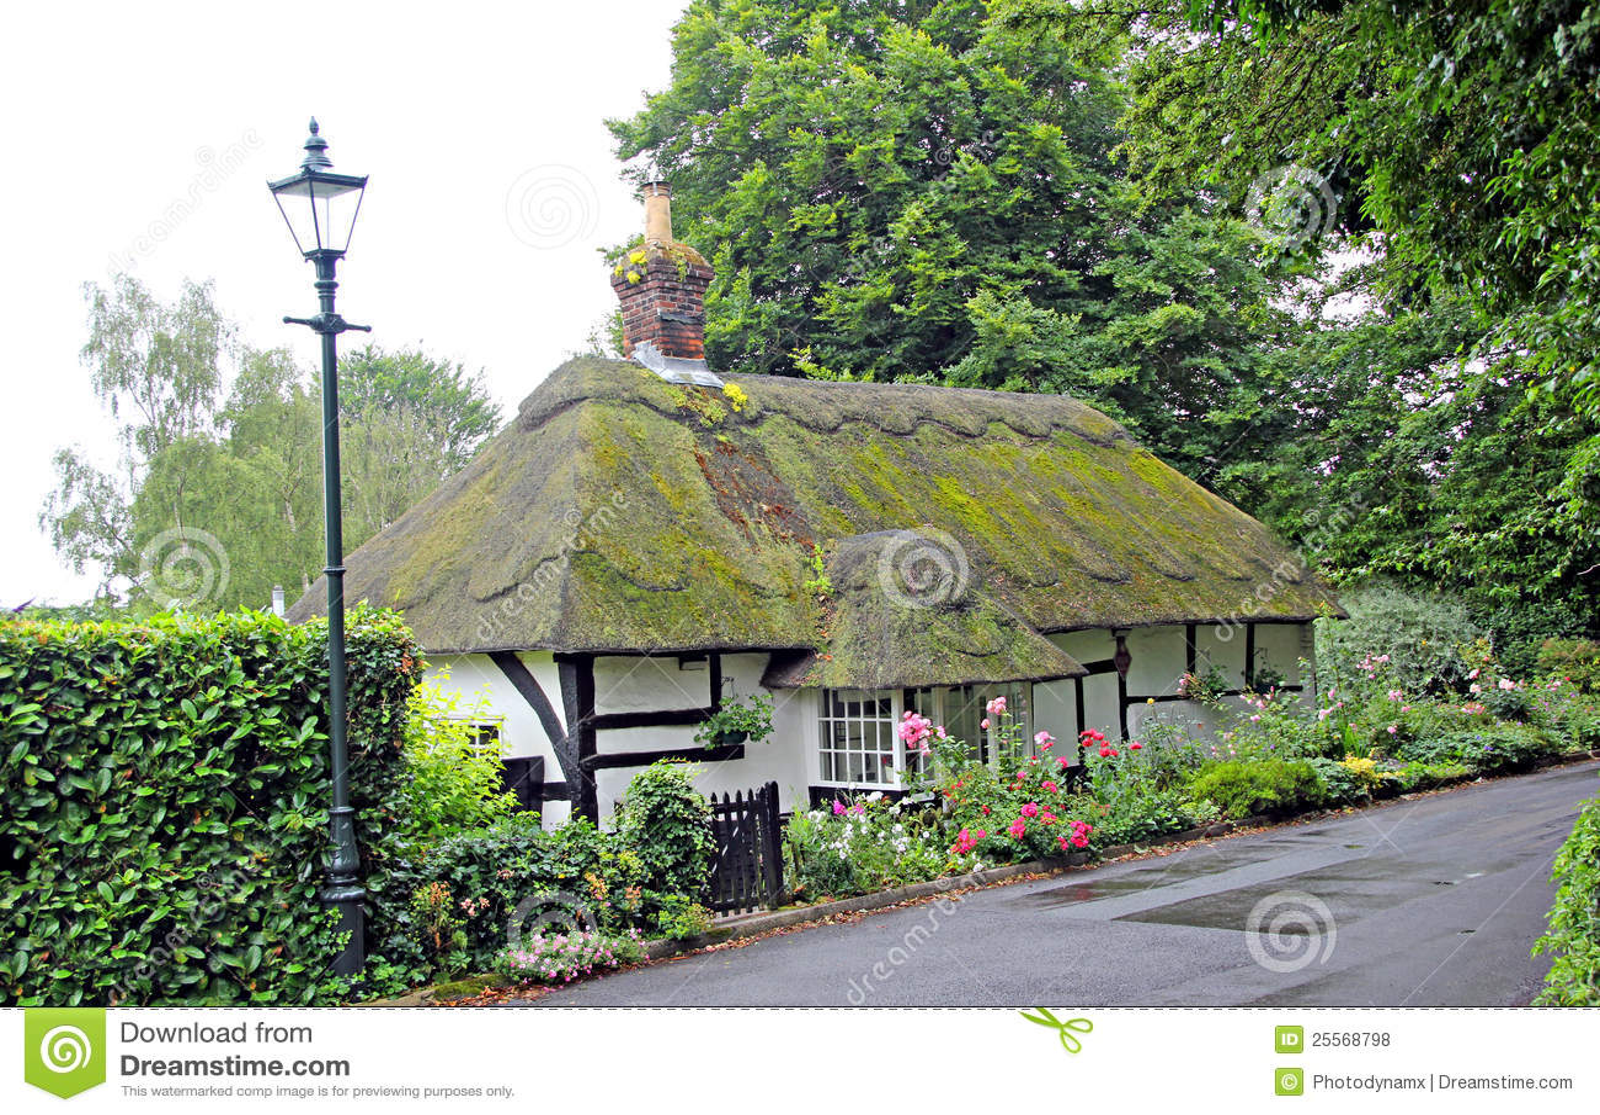 Kent chocolate box cottage